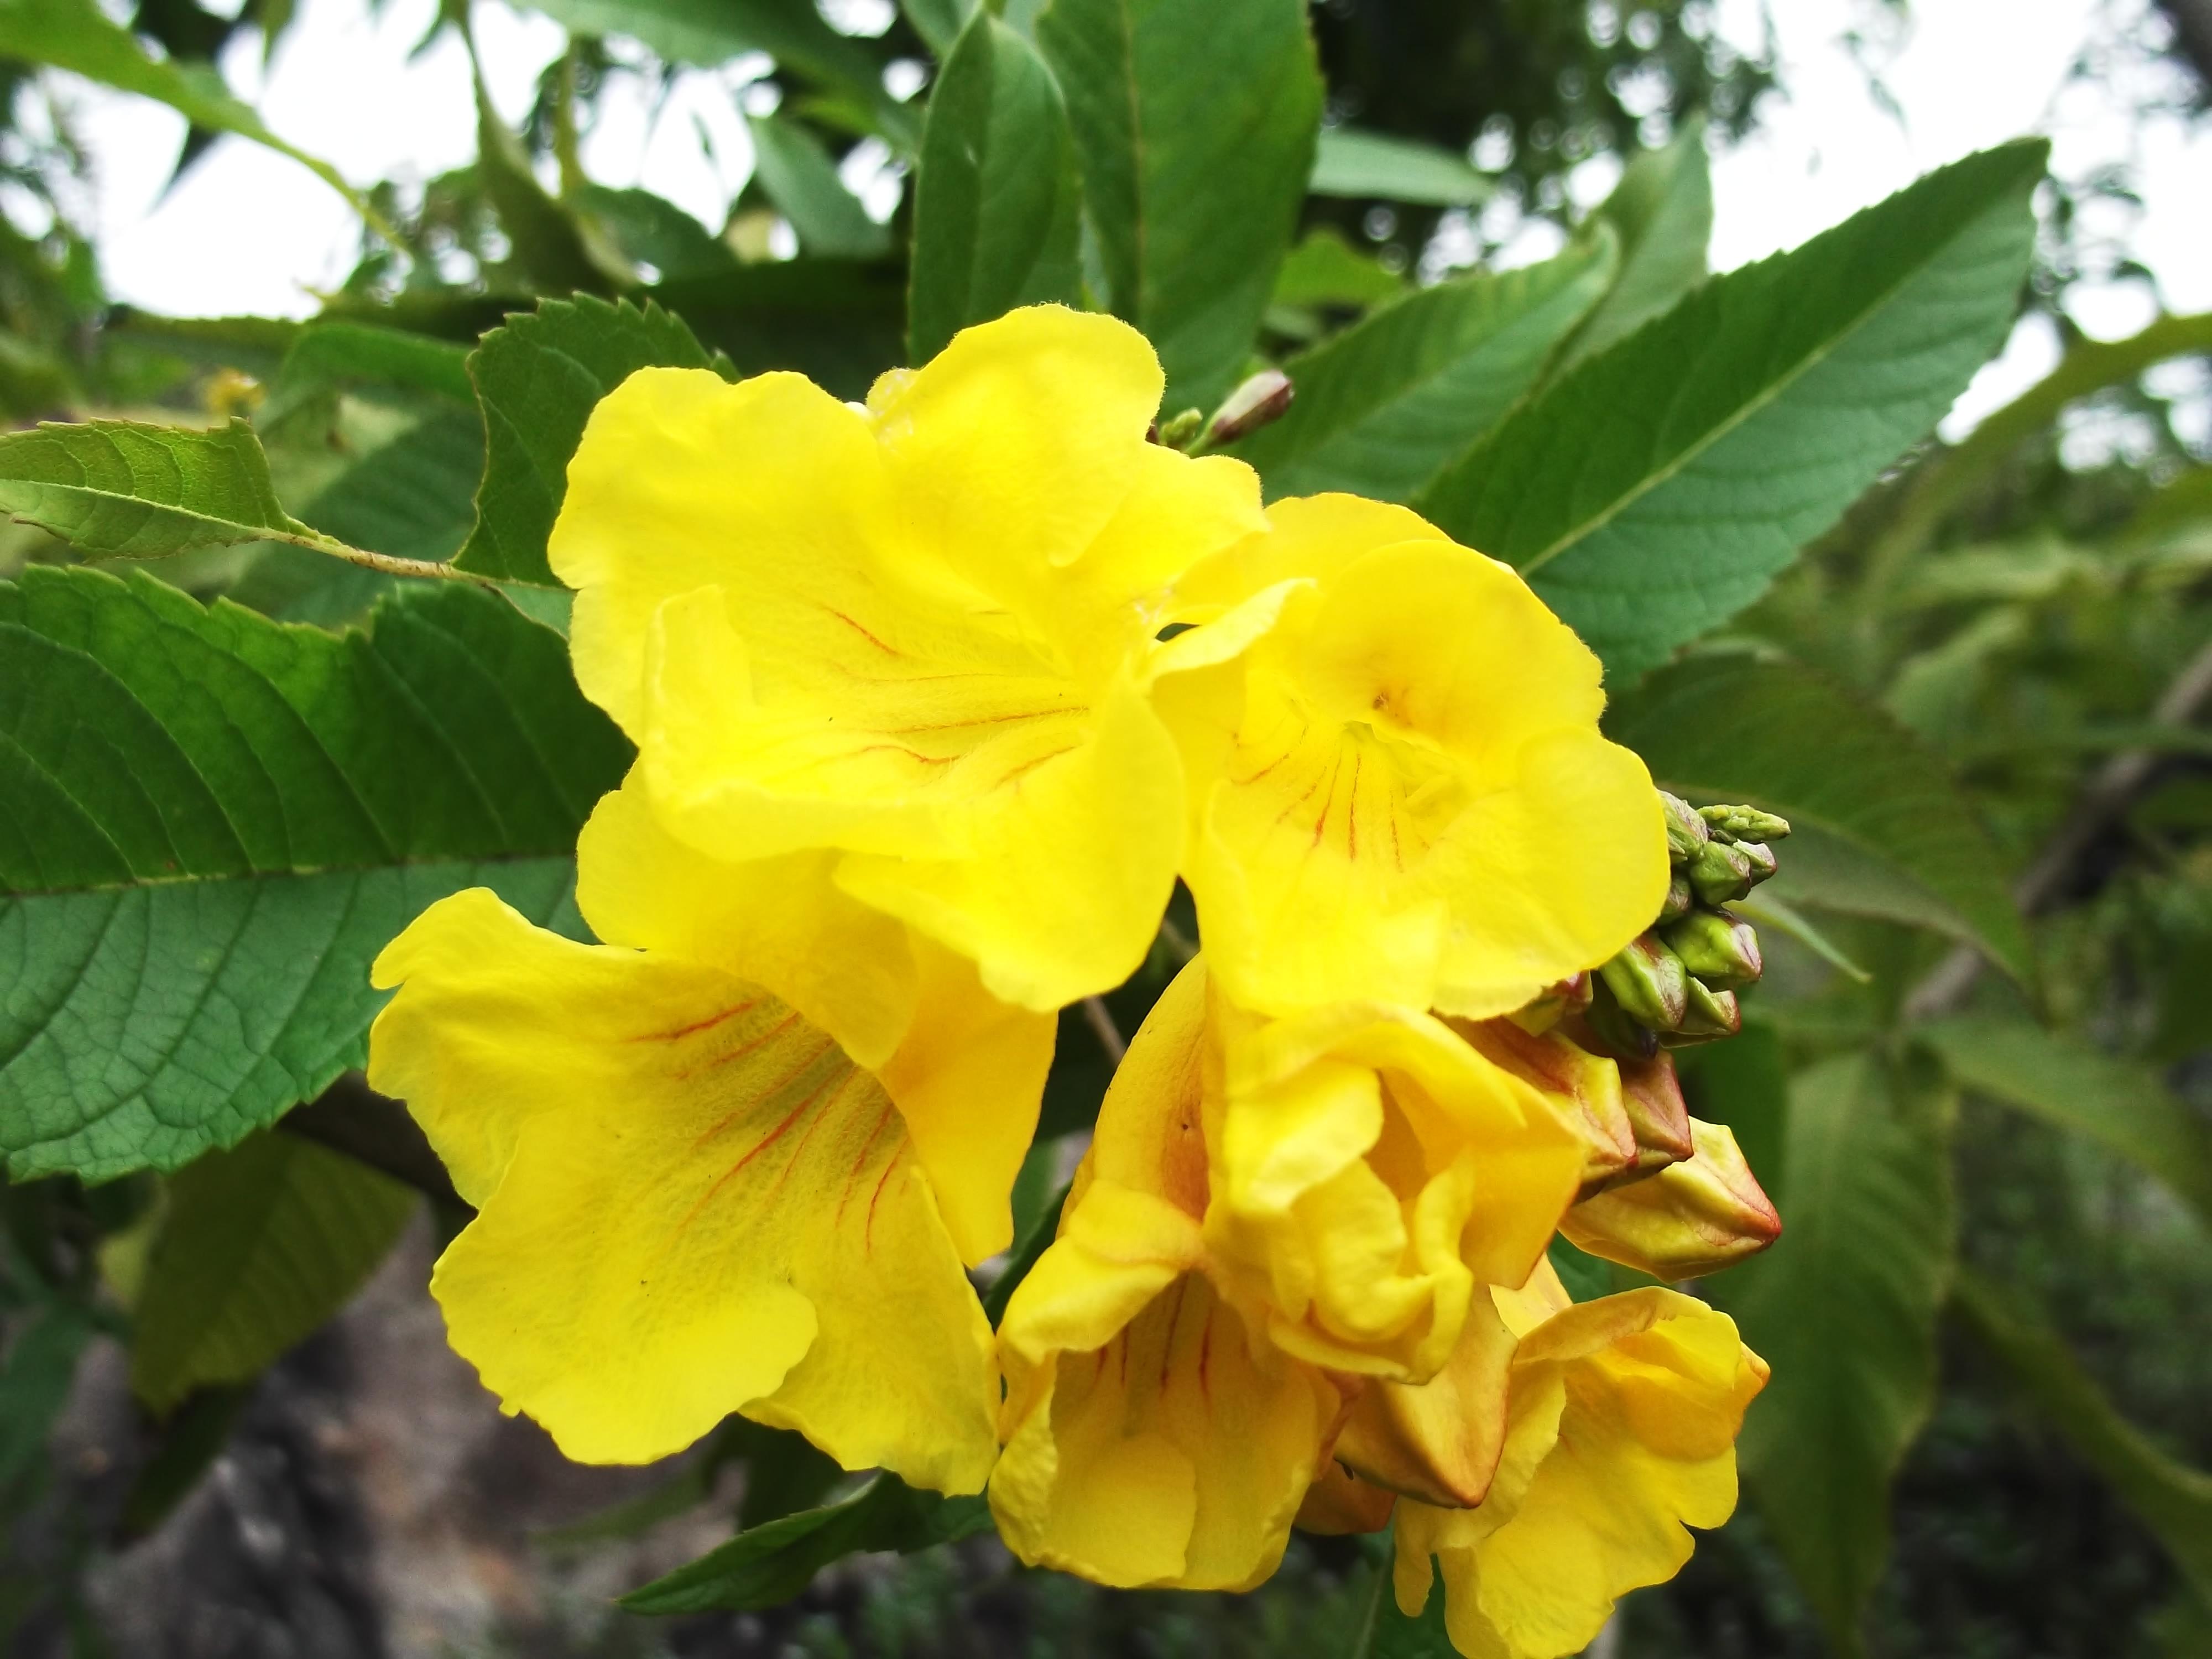 Filetecoma stans flowers yercaud salem indiag wikimedia commons filetecoma stans flowers yercaud salem indiag mightylinksfo